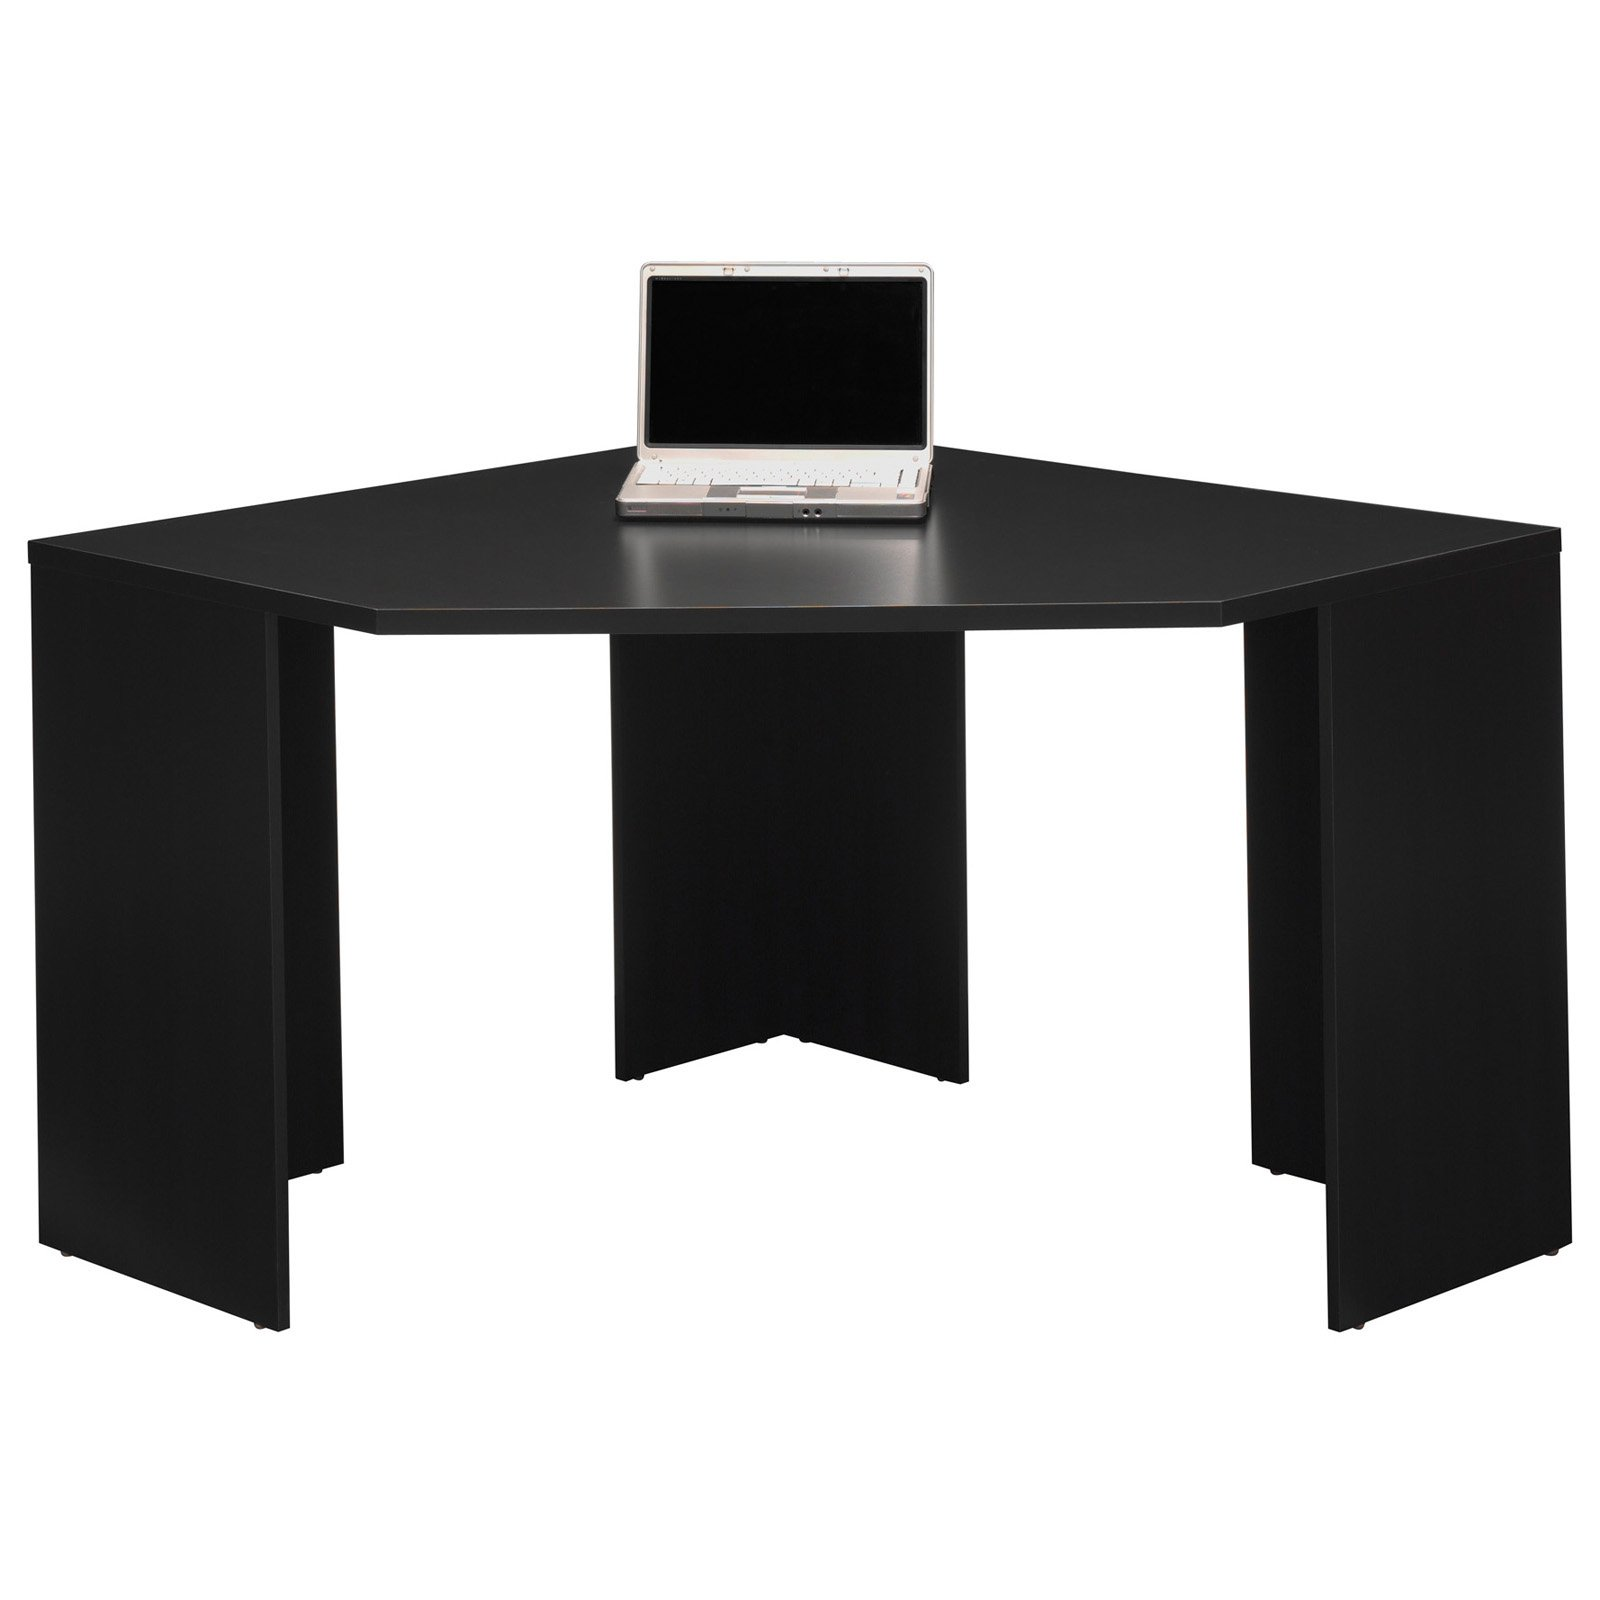 Bush My E Stockport Corner Computer Desk With Optional Hutch And File Cabinet